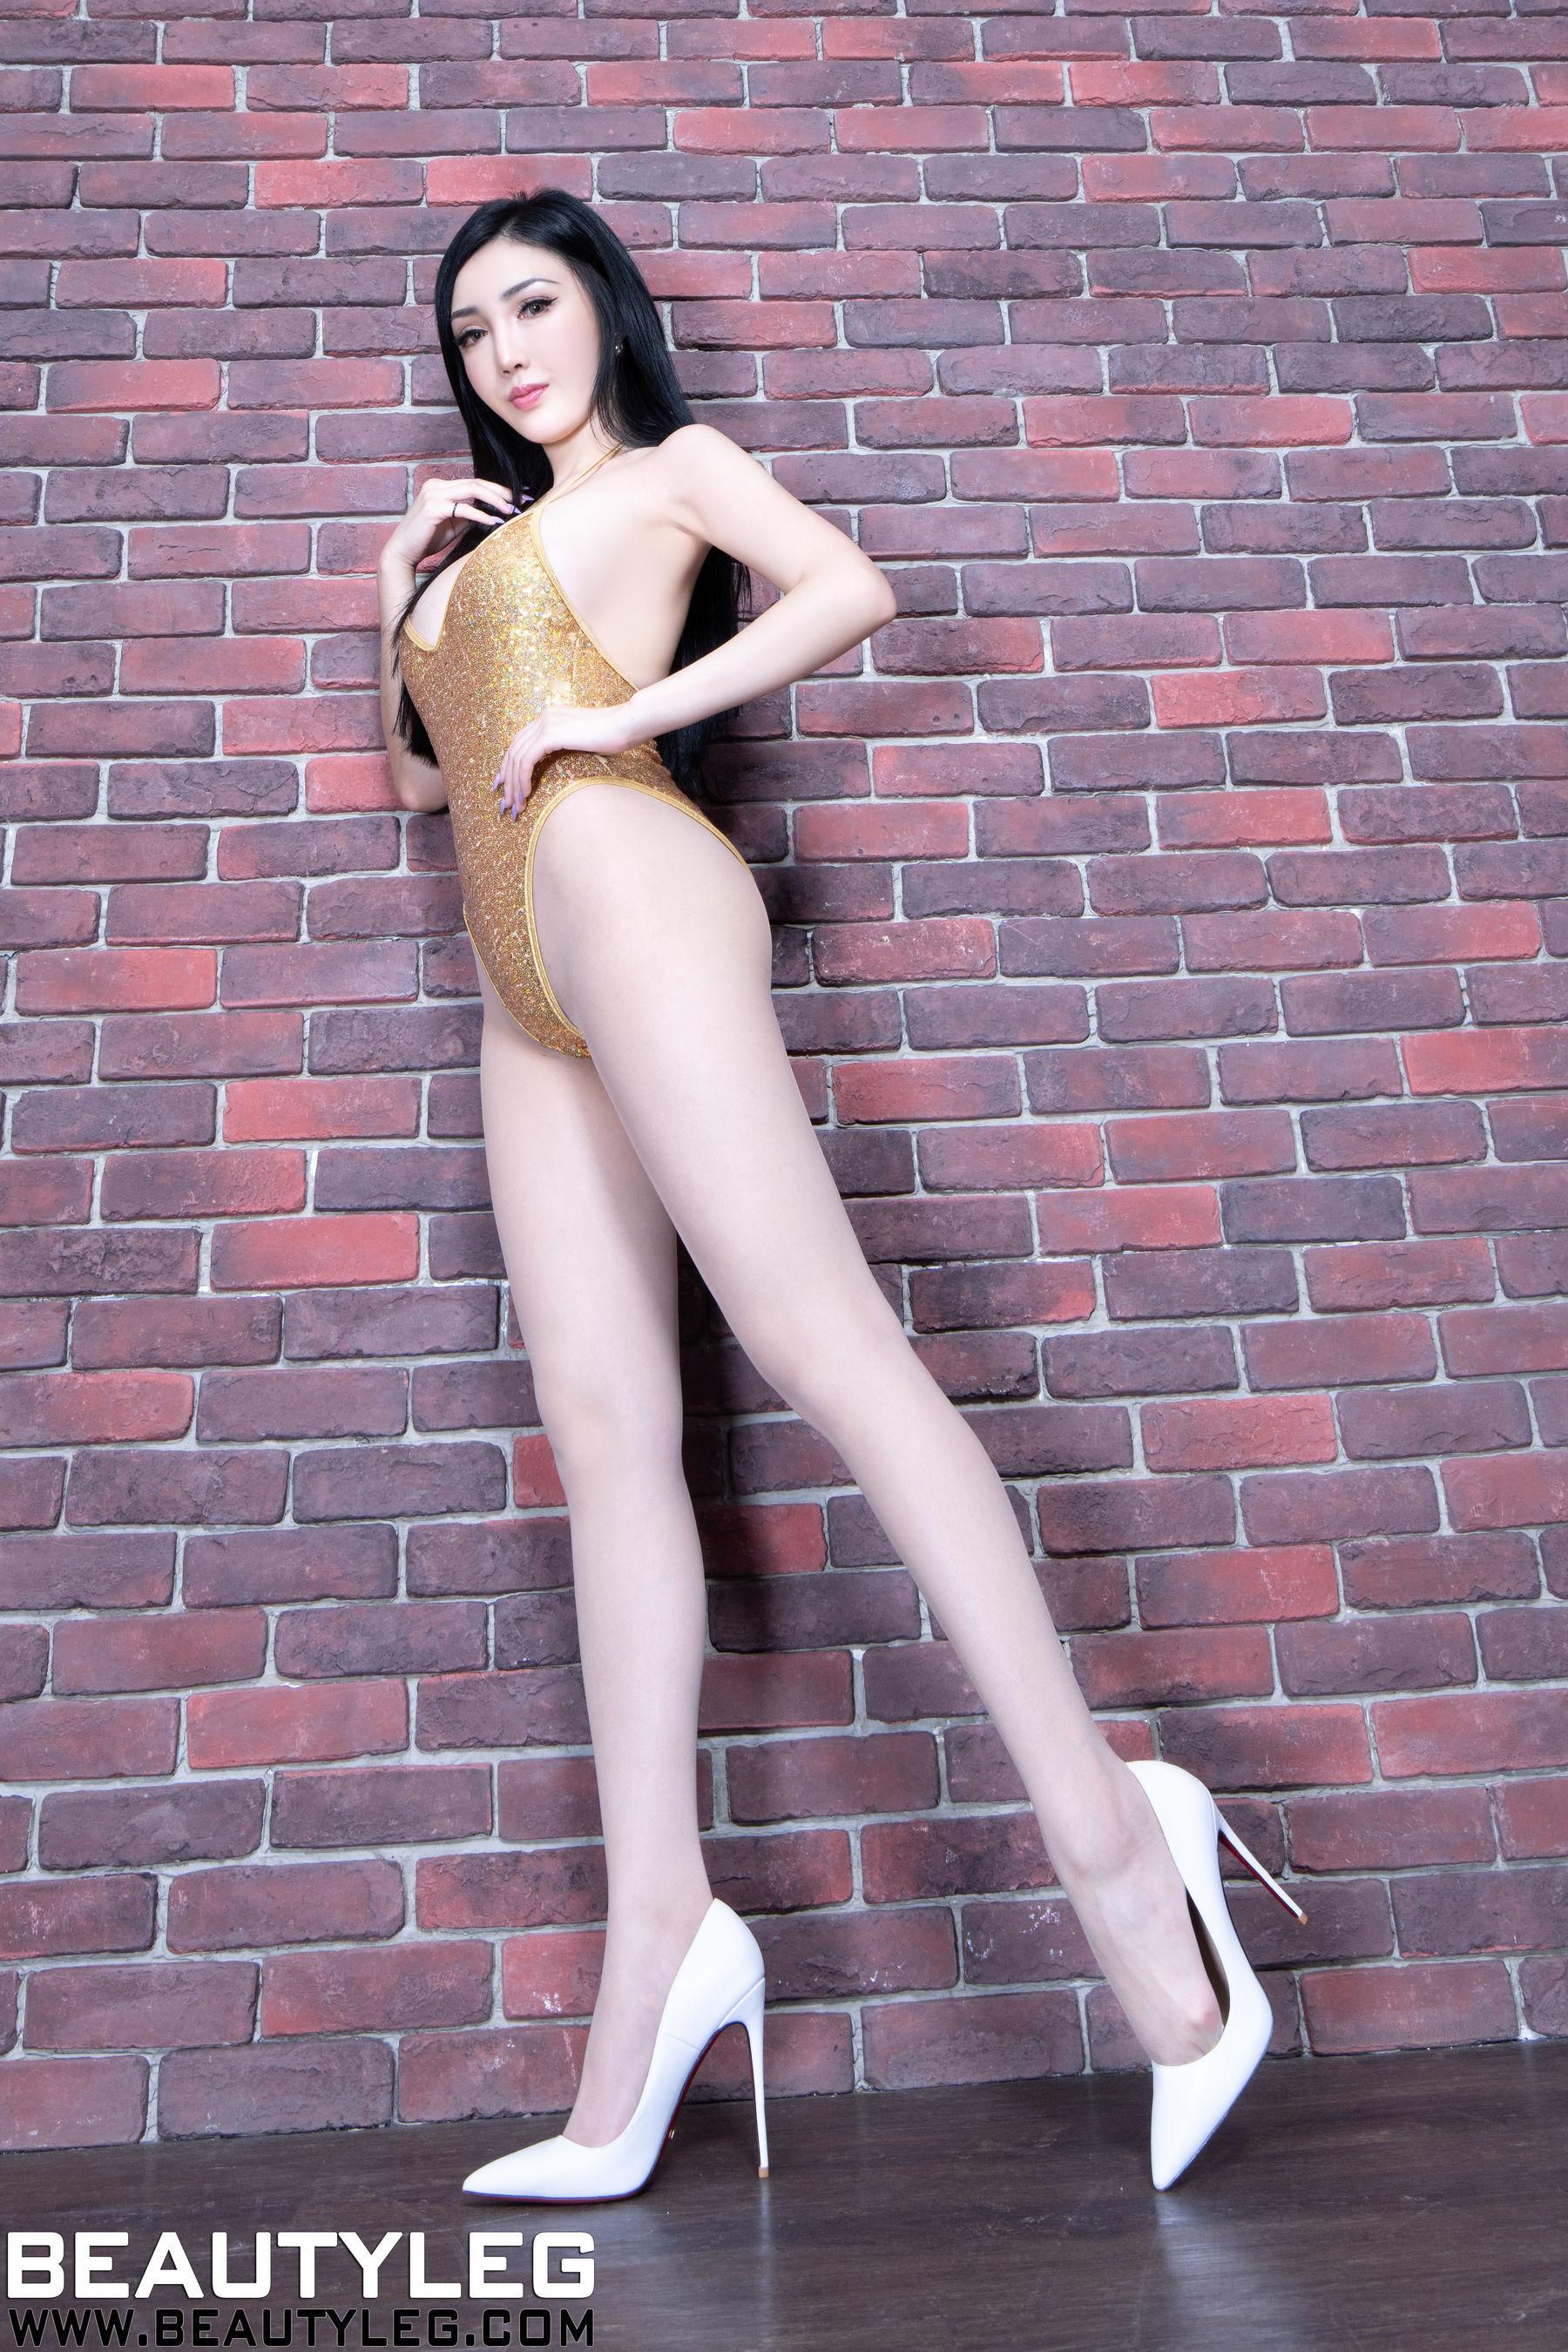 VOL.1476 [Beautyleg]美腿:赵芸(腿模Syuan,Syuan赵芸)超高清个人性感漂亮大图(31P)